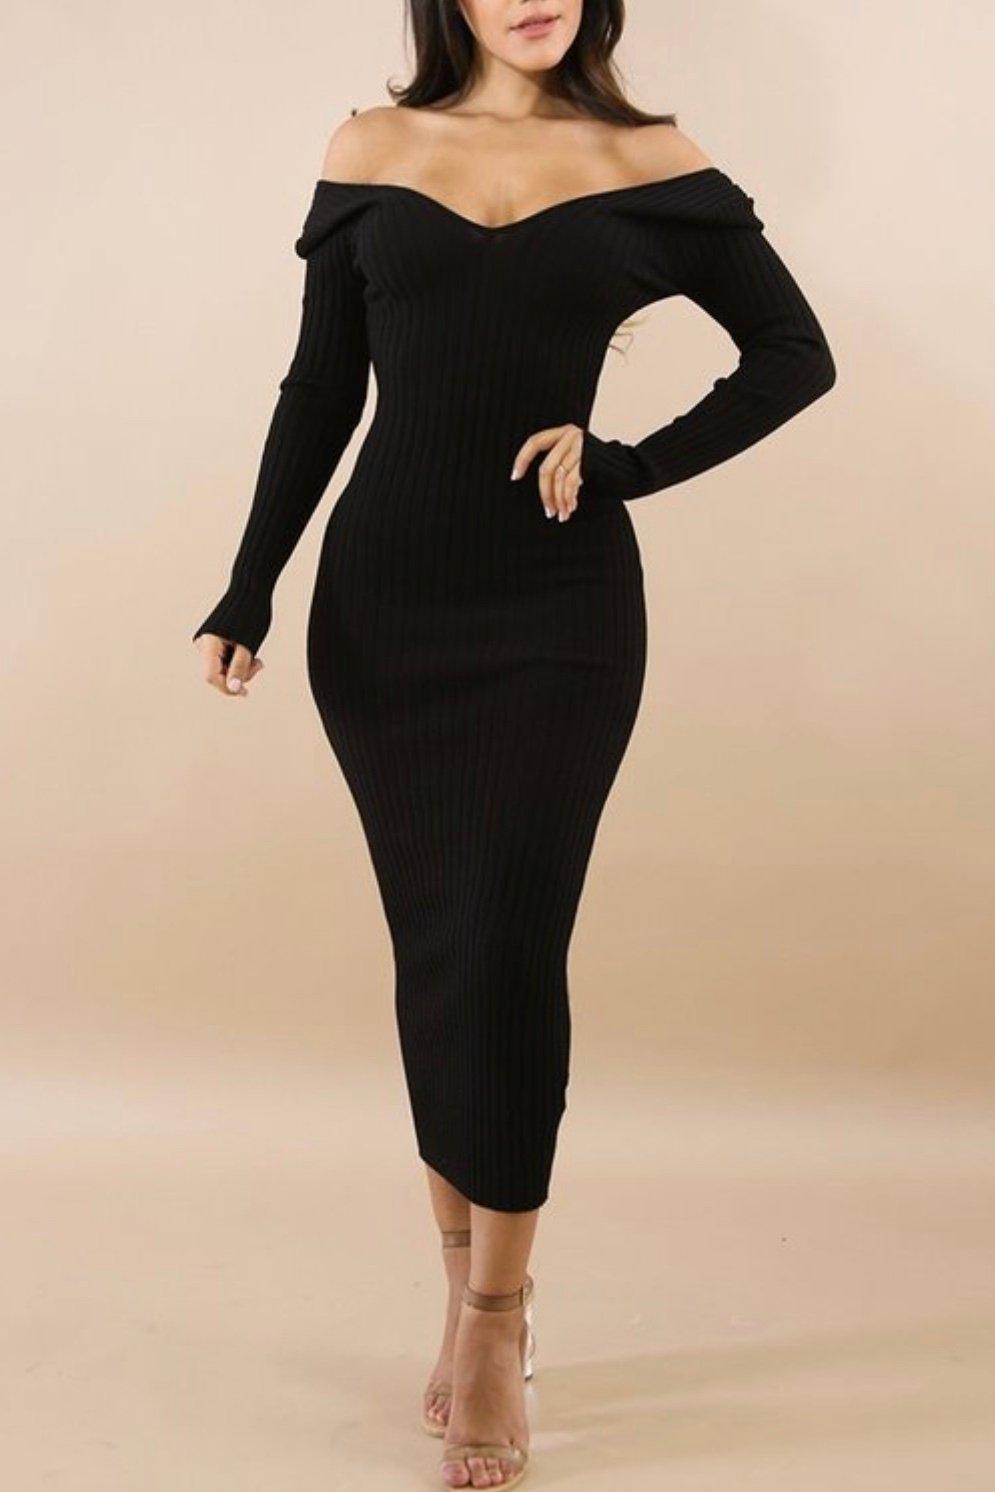 Image of Black  Sophisticated Dress